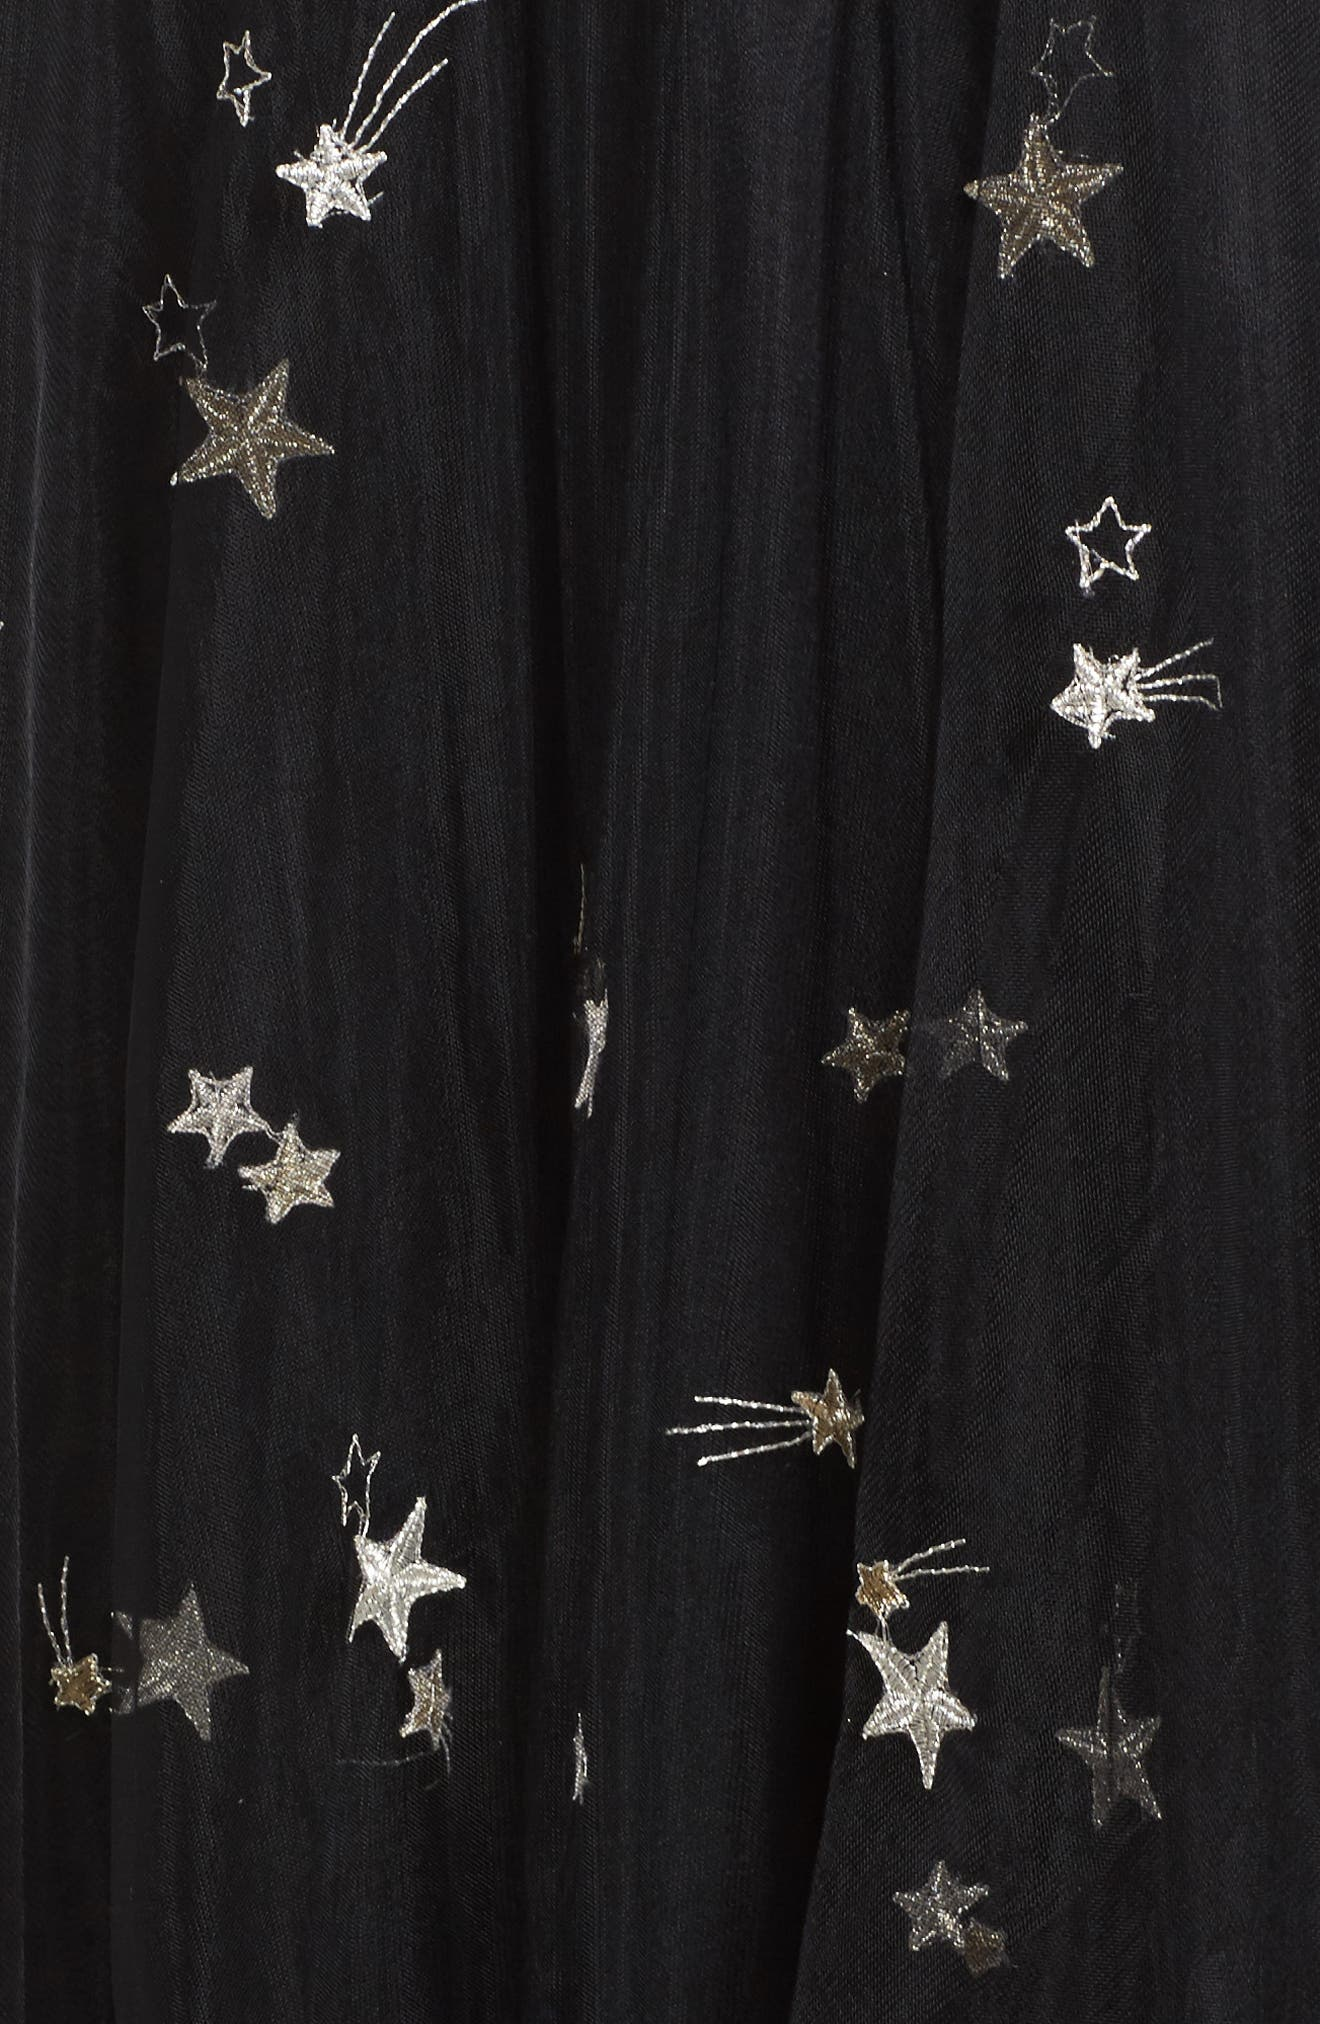 Chelsea Starry Night Embroidered Halter Maxi Dress,                             Alternate thumbnail 5, color,                             Black/ Metallic